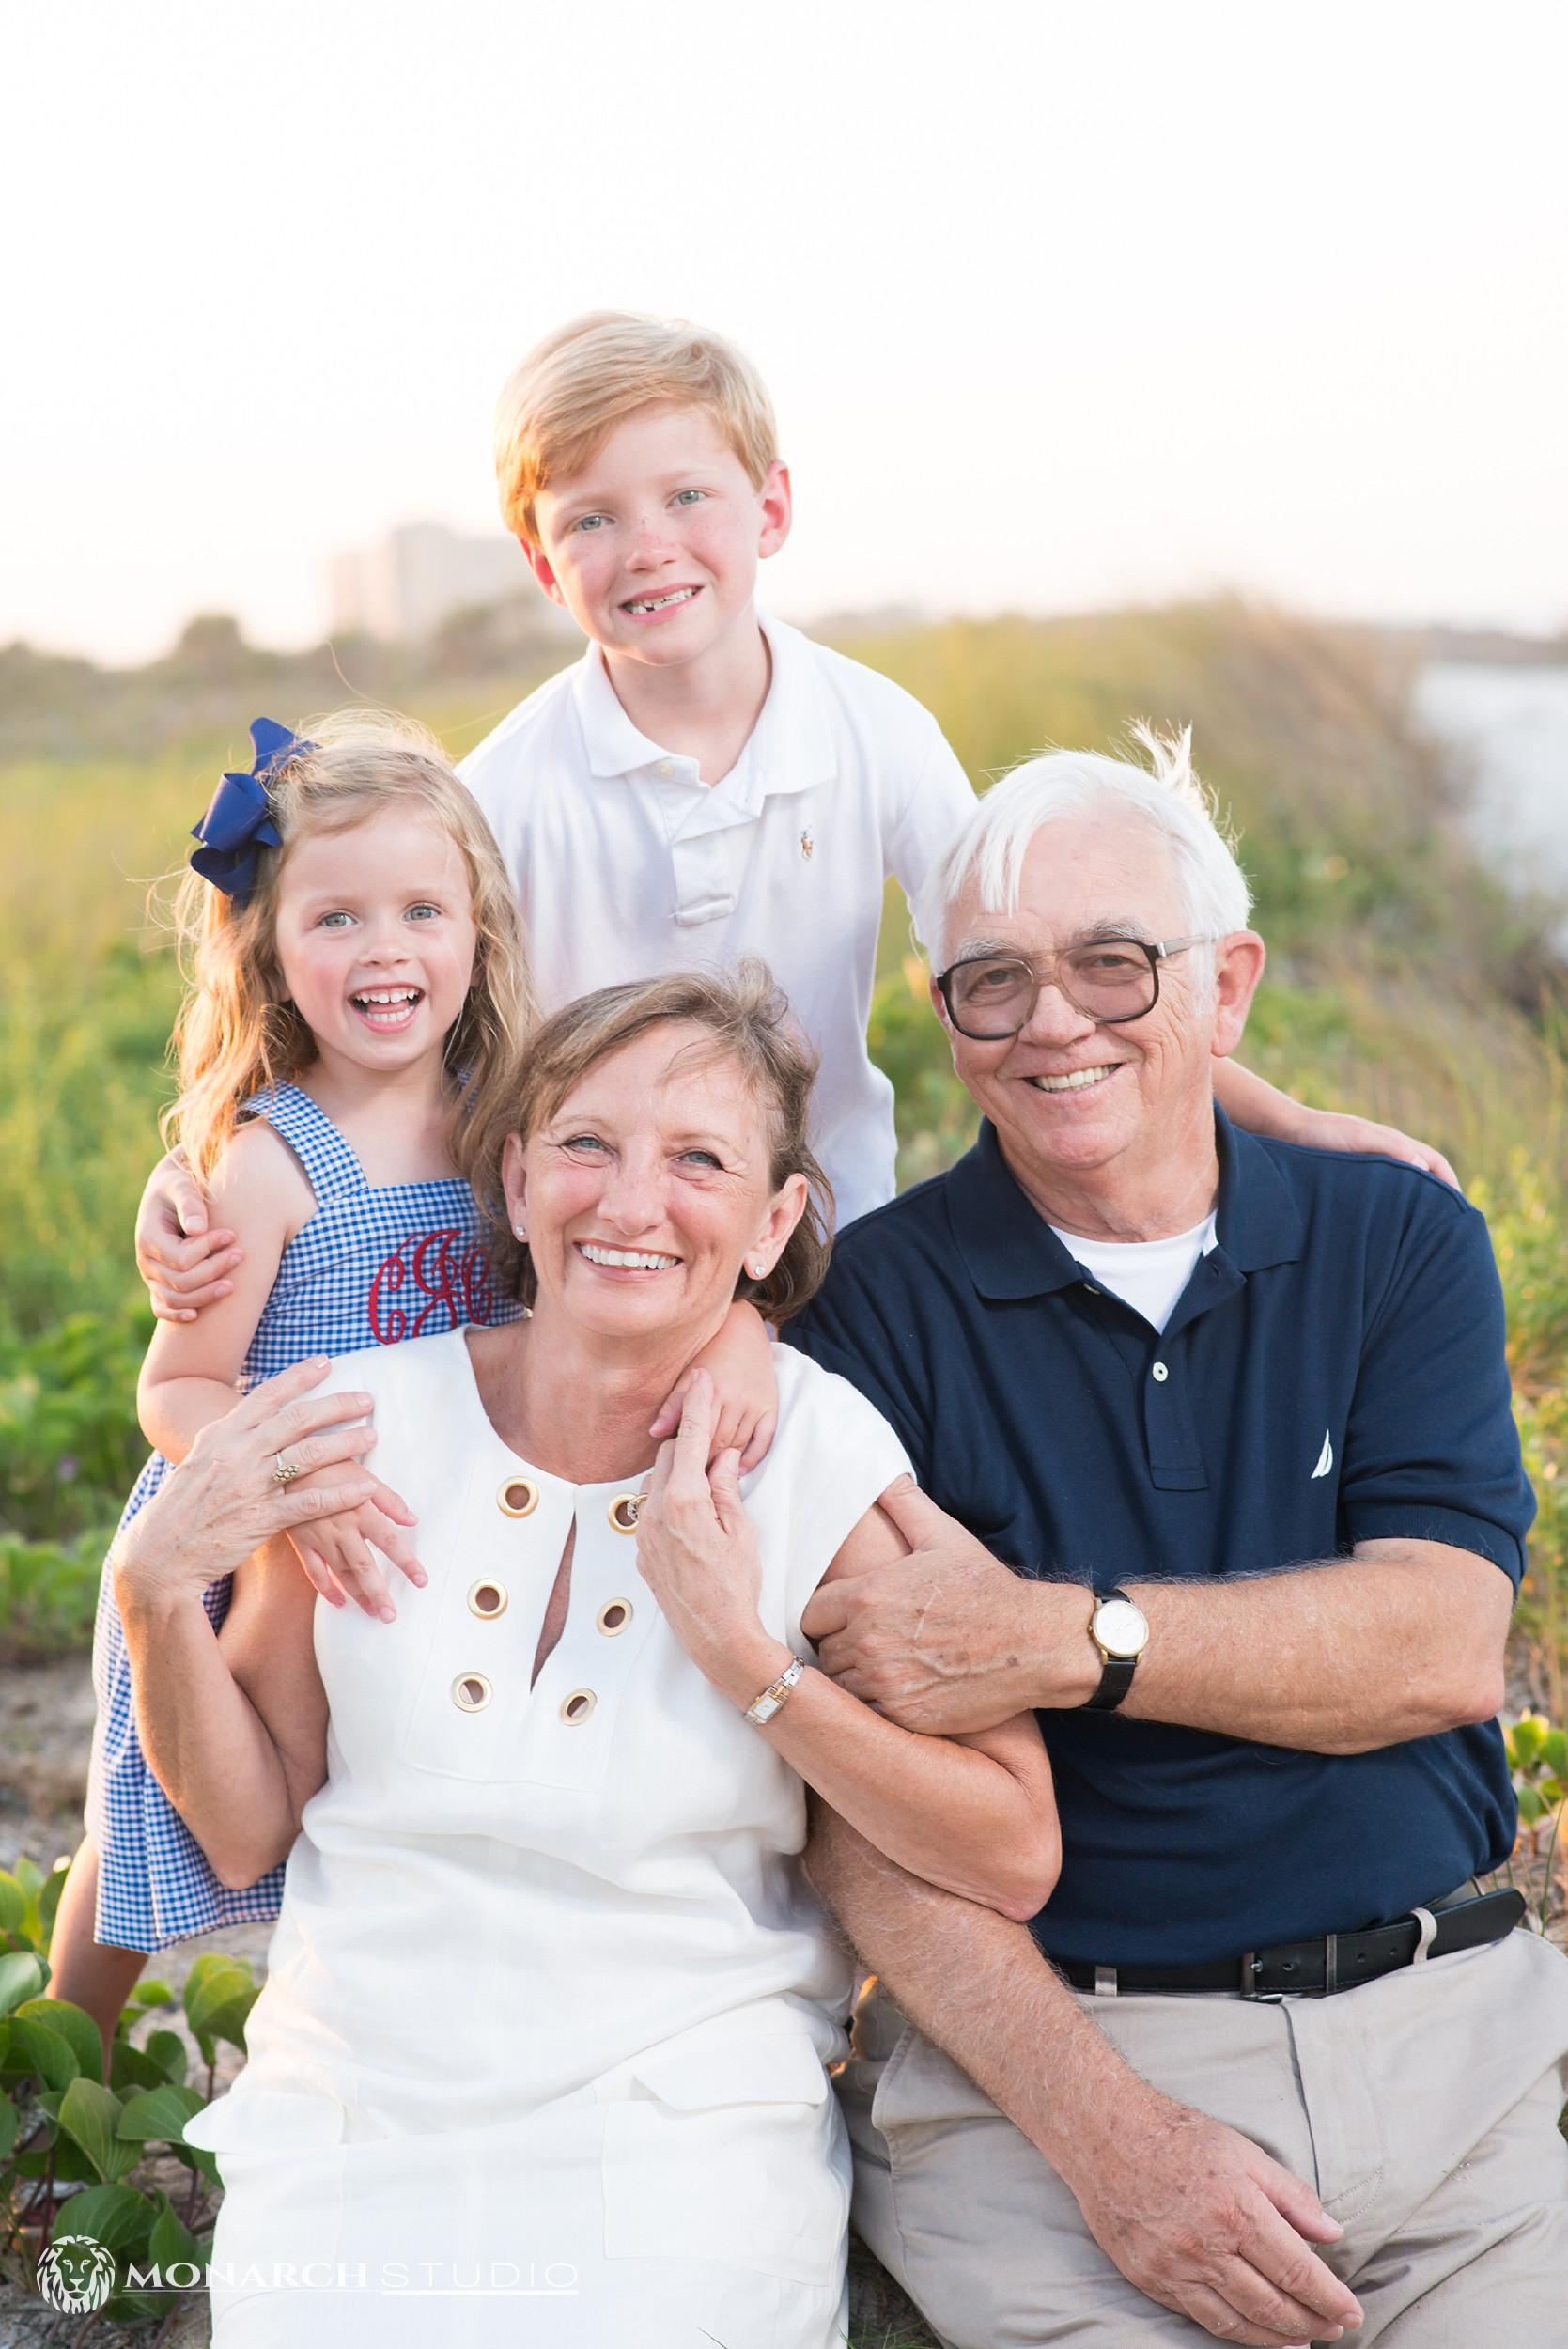 St-Augustine-Beach-Family-Portrait-Photographer_0018.jpg